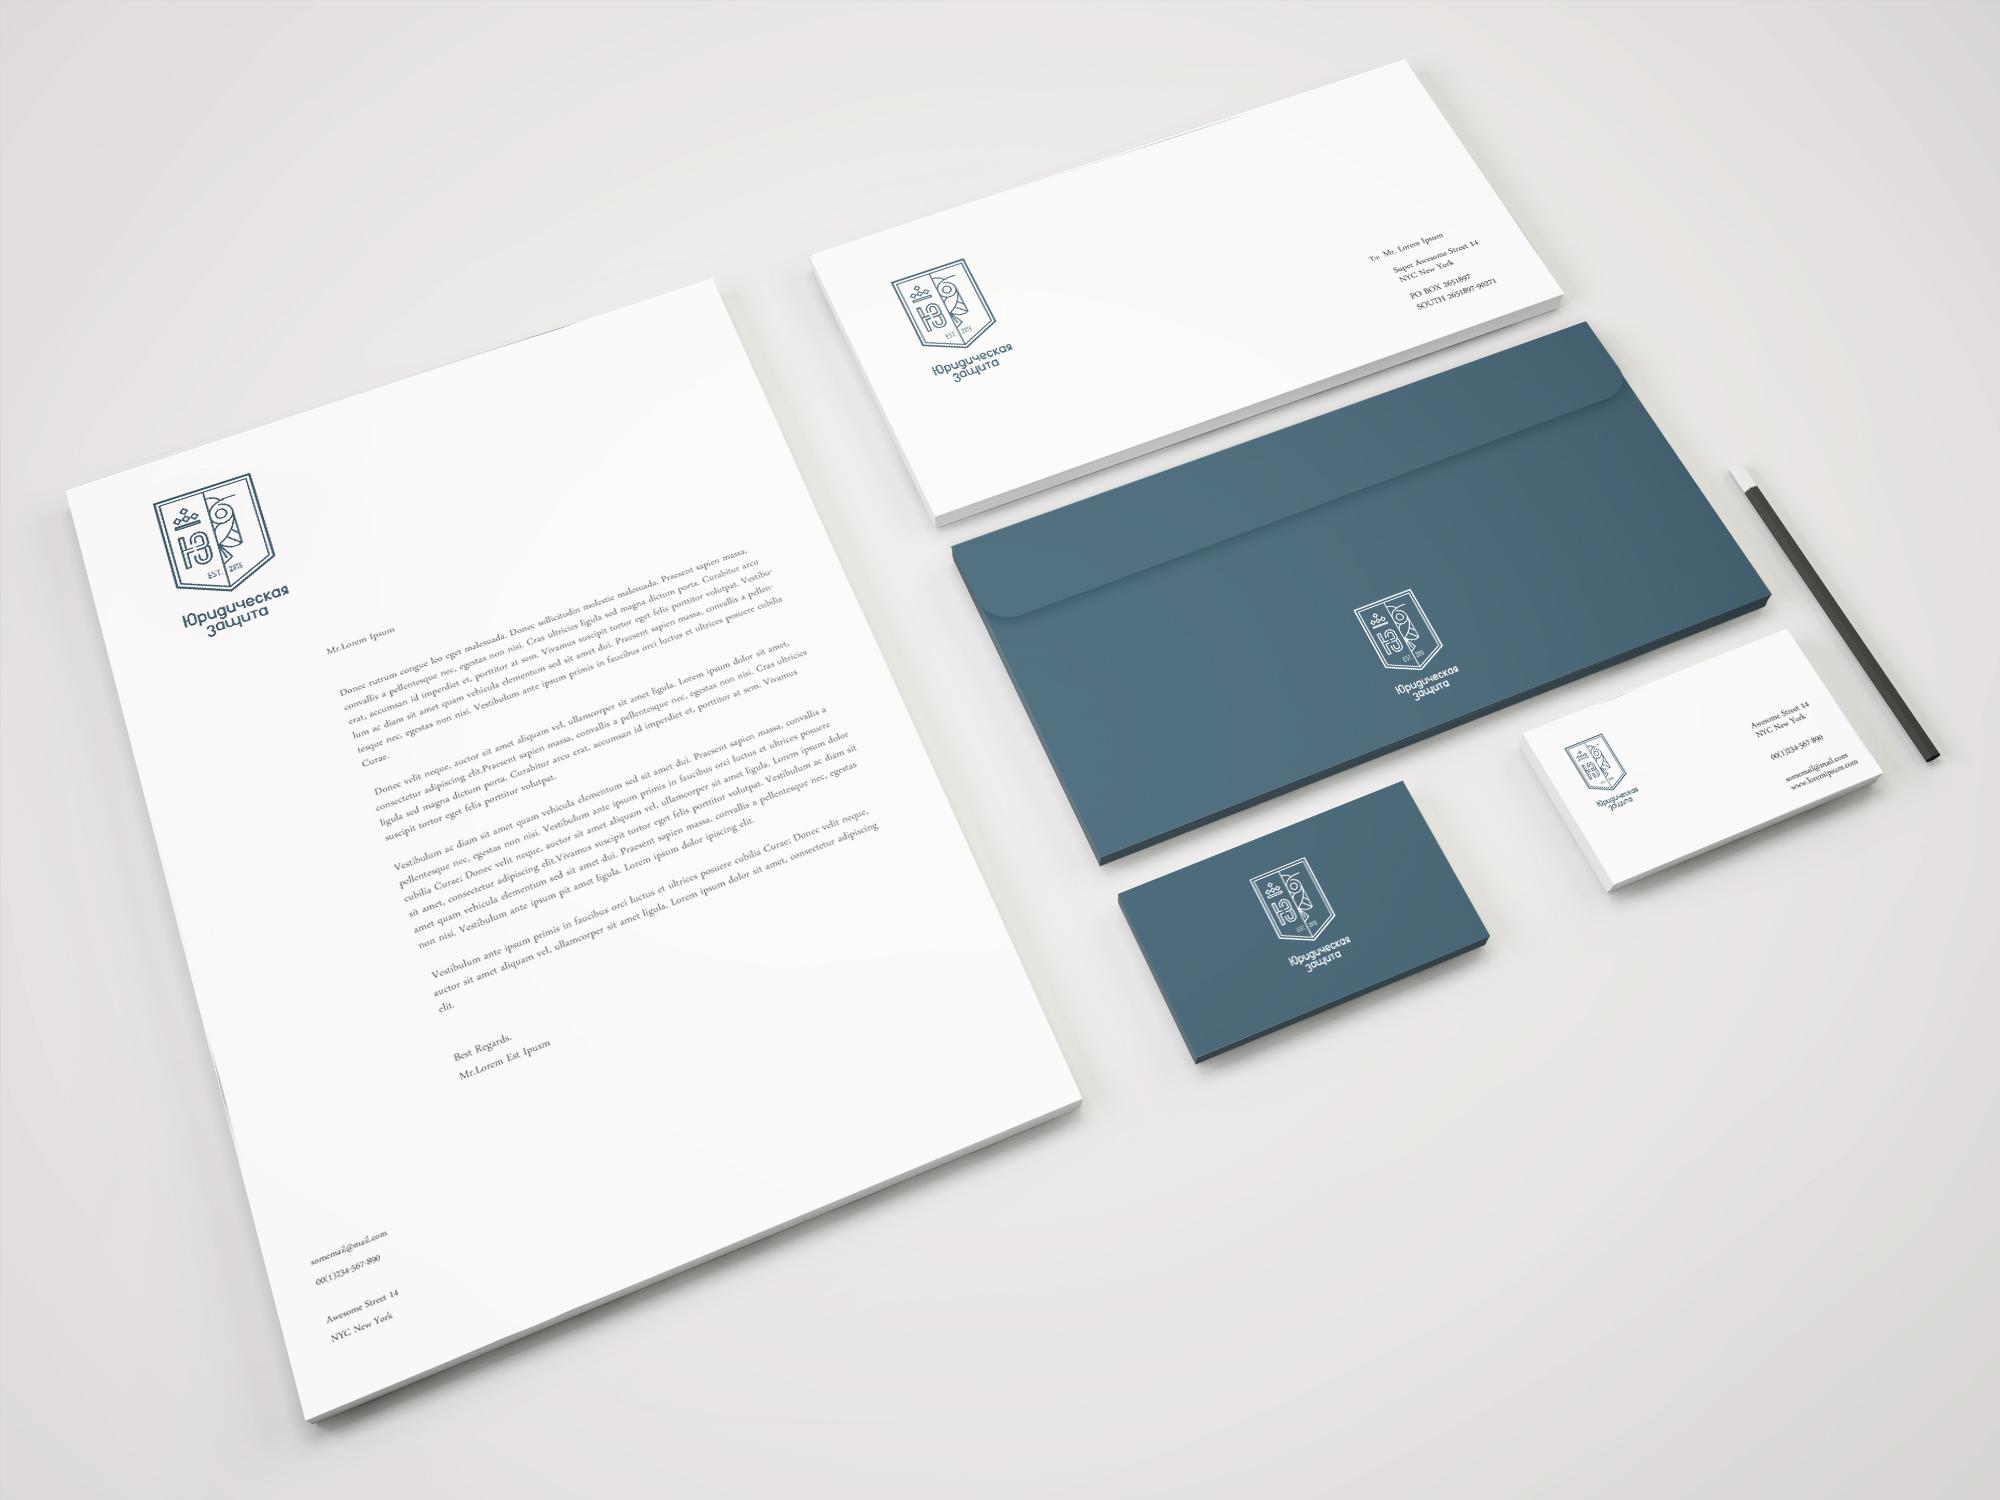 Разработка логотипа для юридической компании фото f_71155e0330713808.jpg